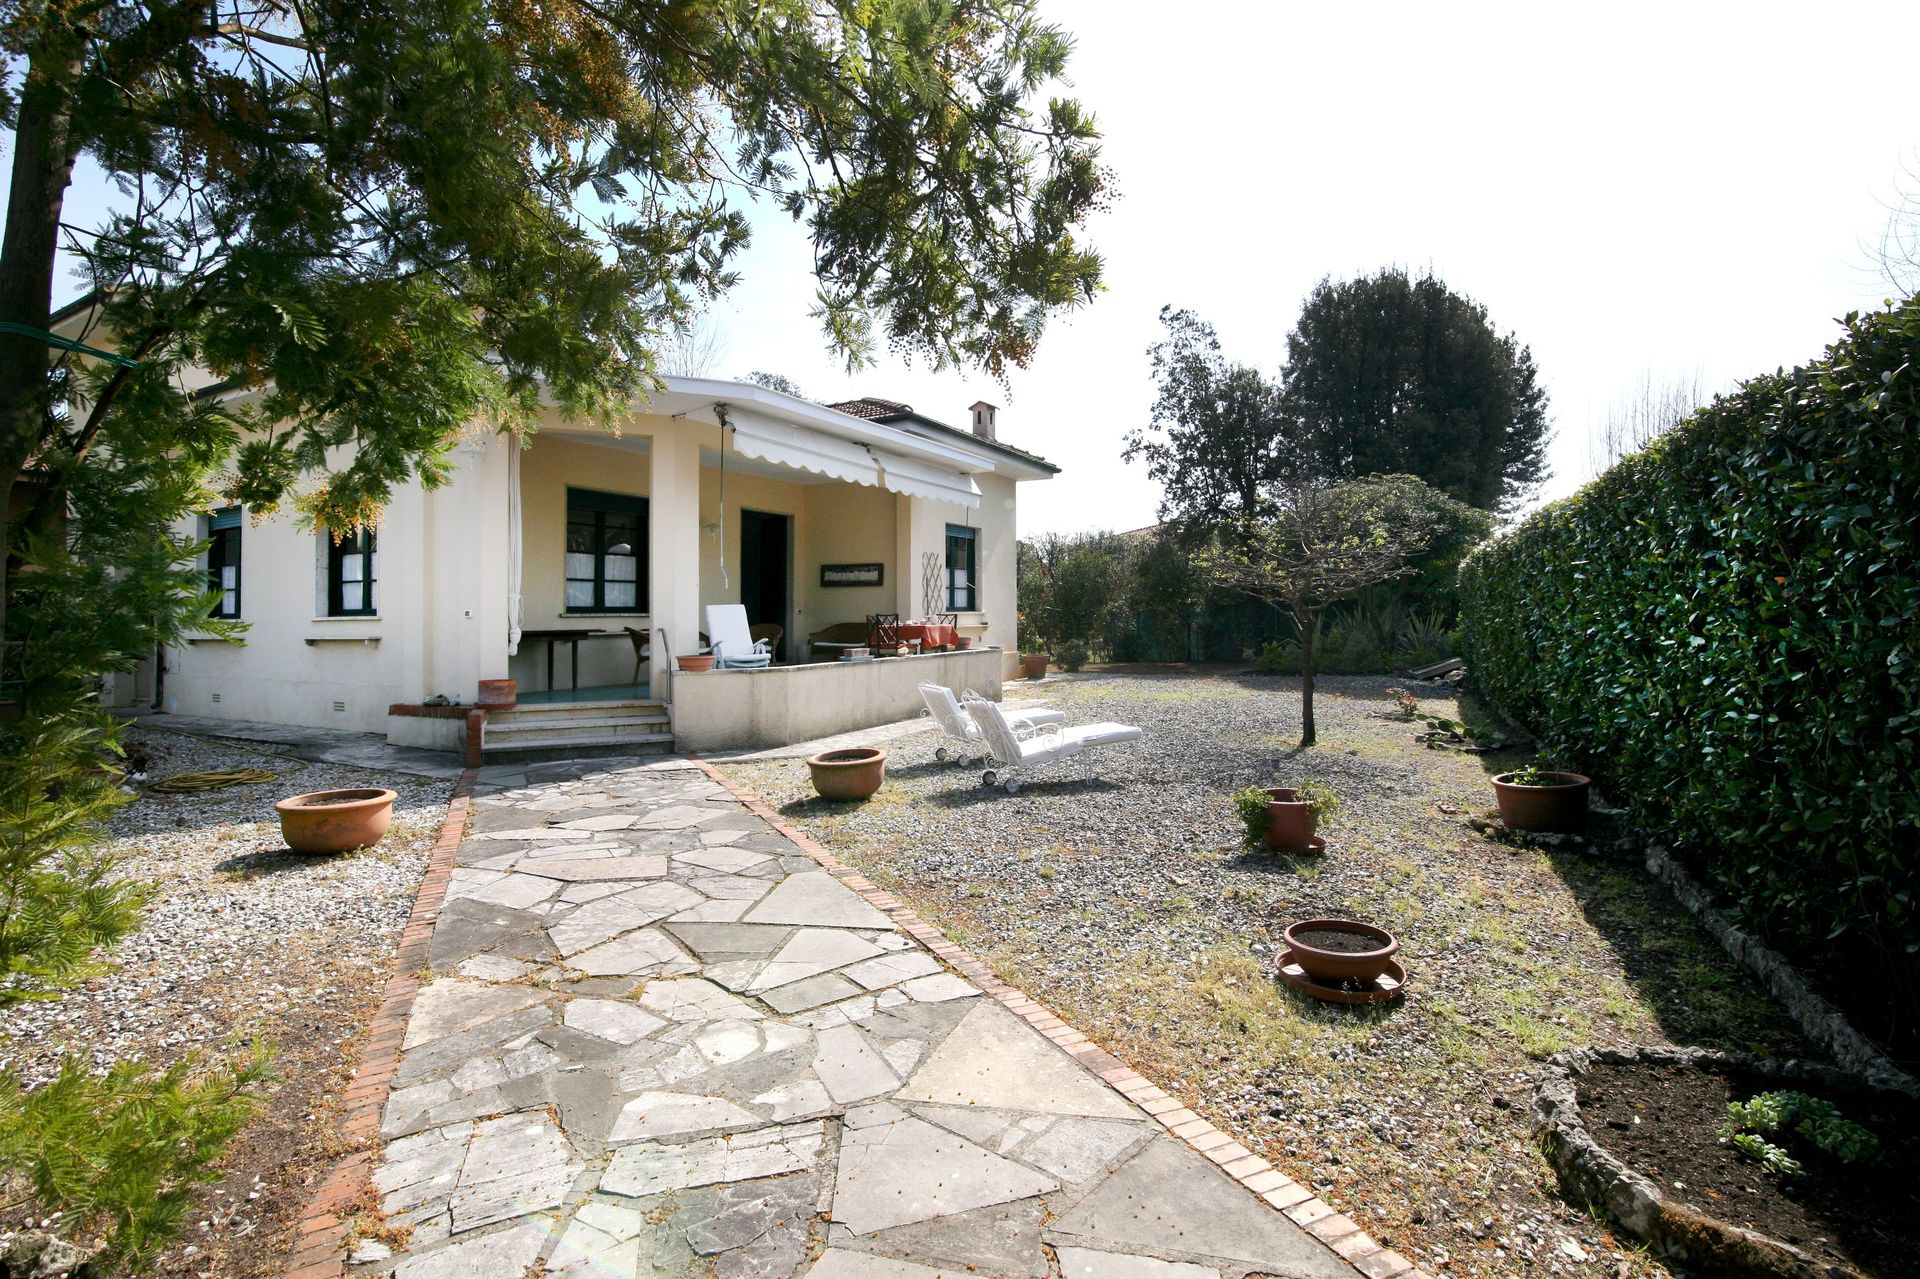 Groovy Forte Dei Marmi Villa Vacation Rental Villa Mazzini That Home Remodeling Inspirations Propsscottssportslandcom